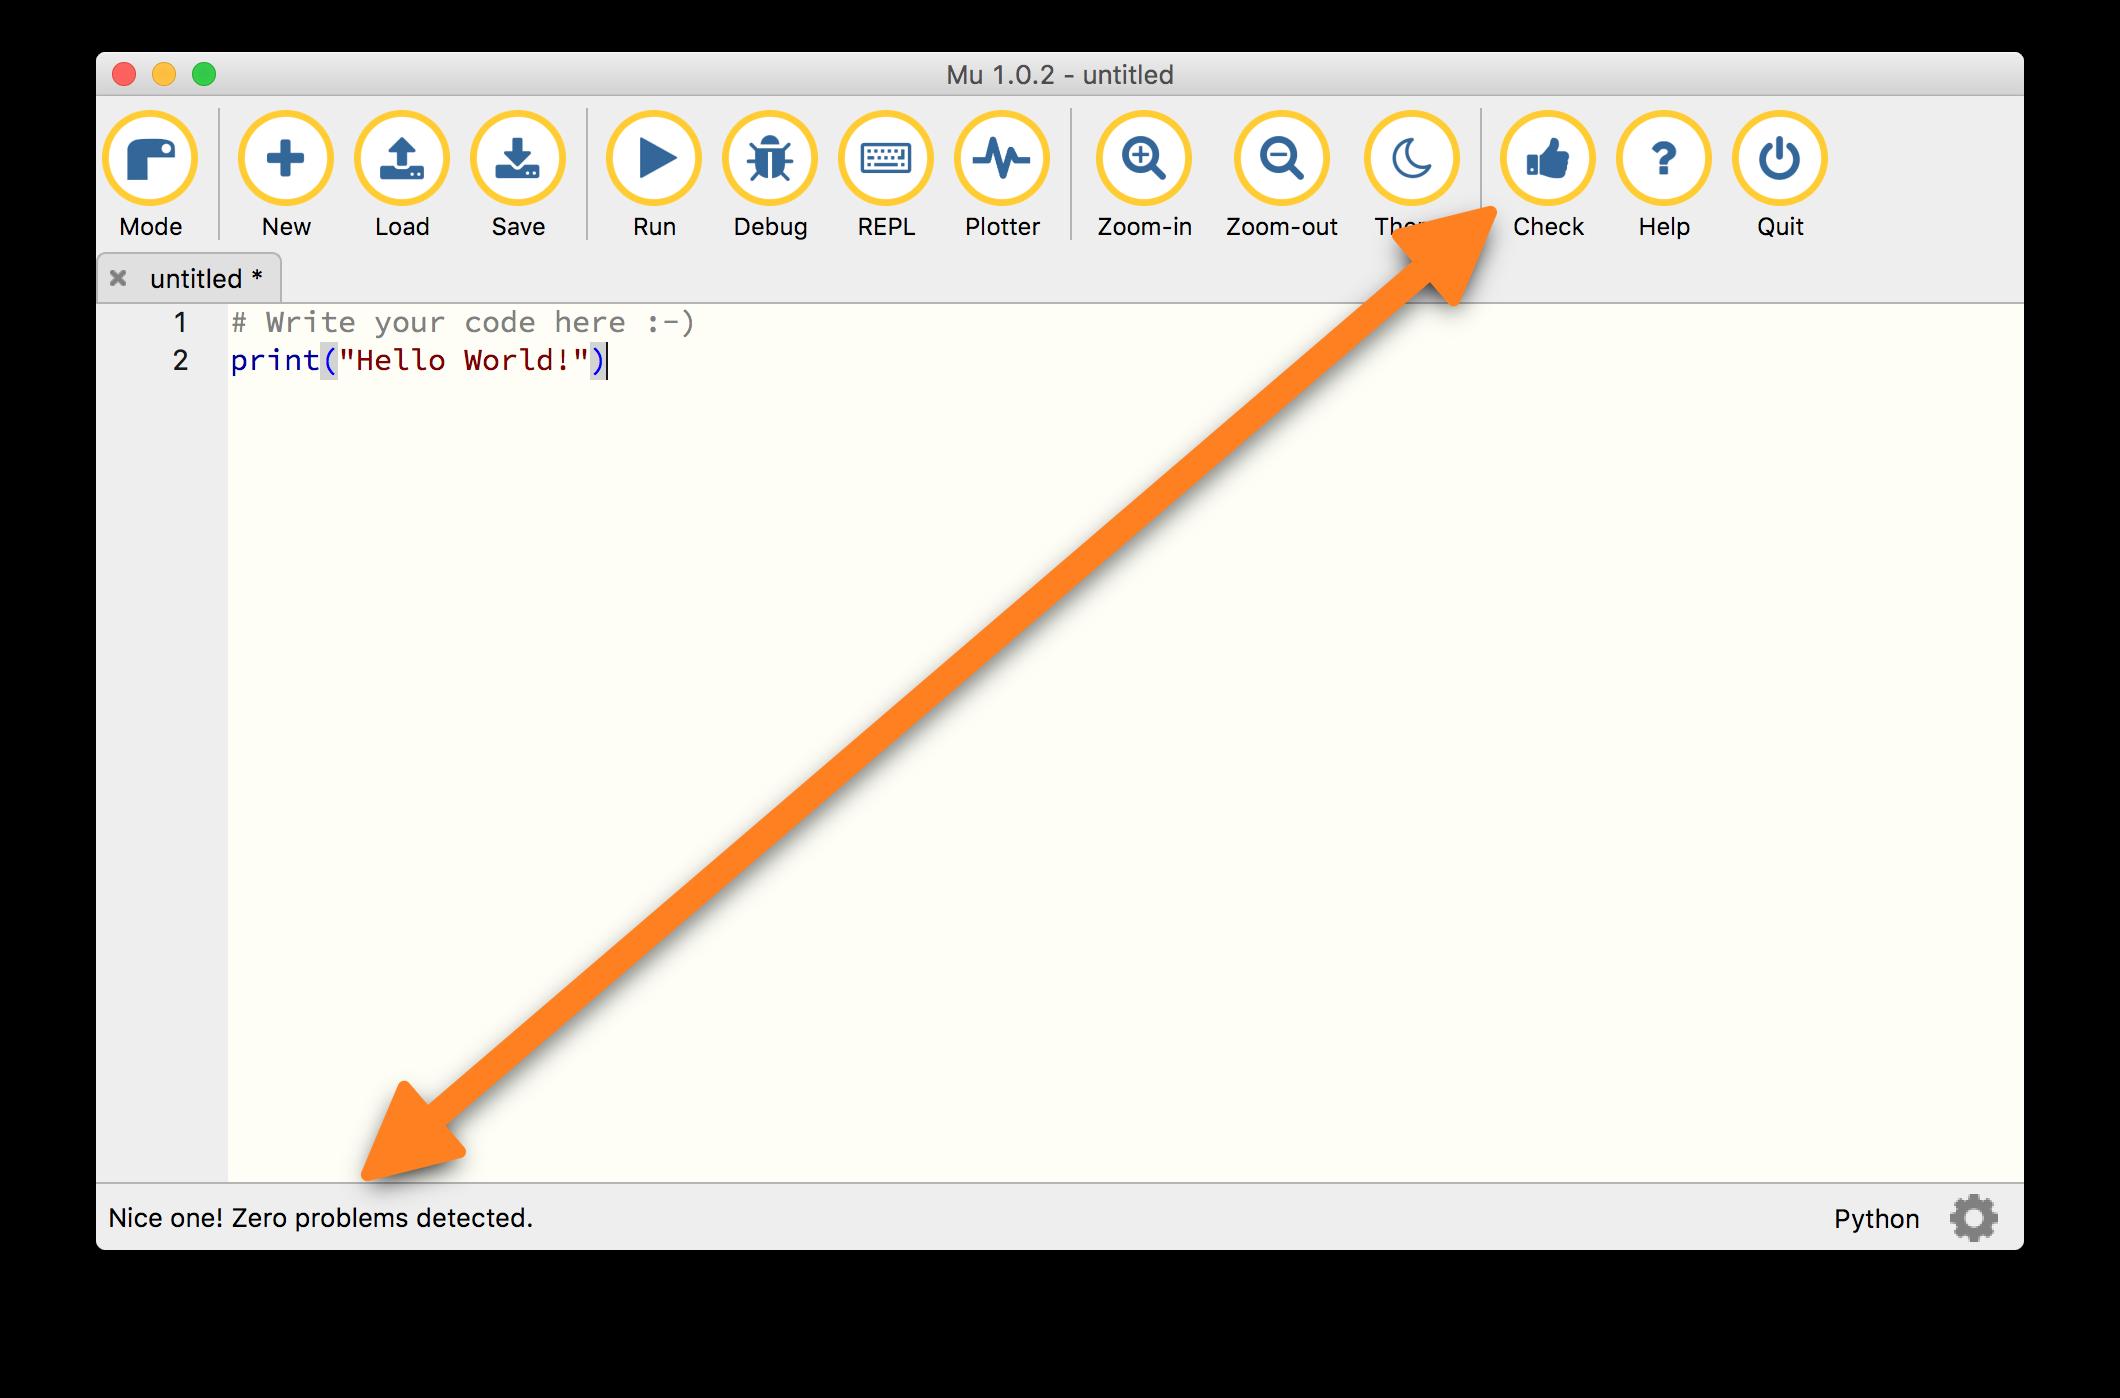 UI/UX | Check button vs  Positive feedback · Issue #762 · mu-editor